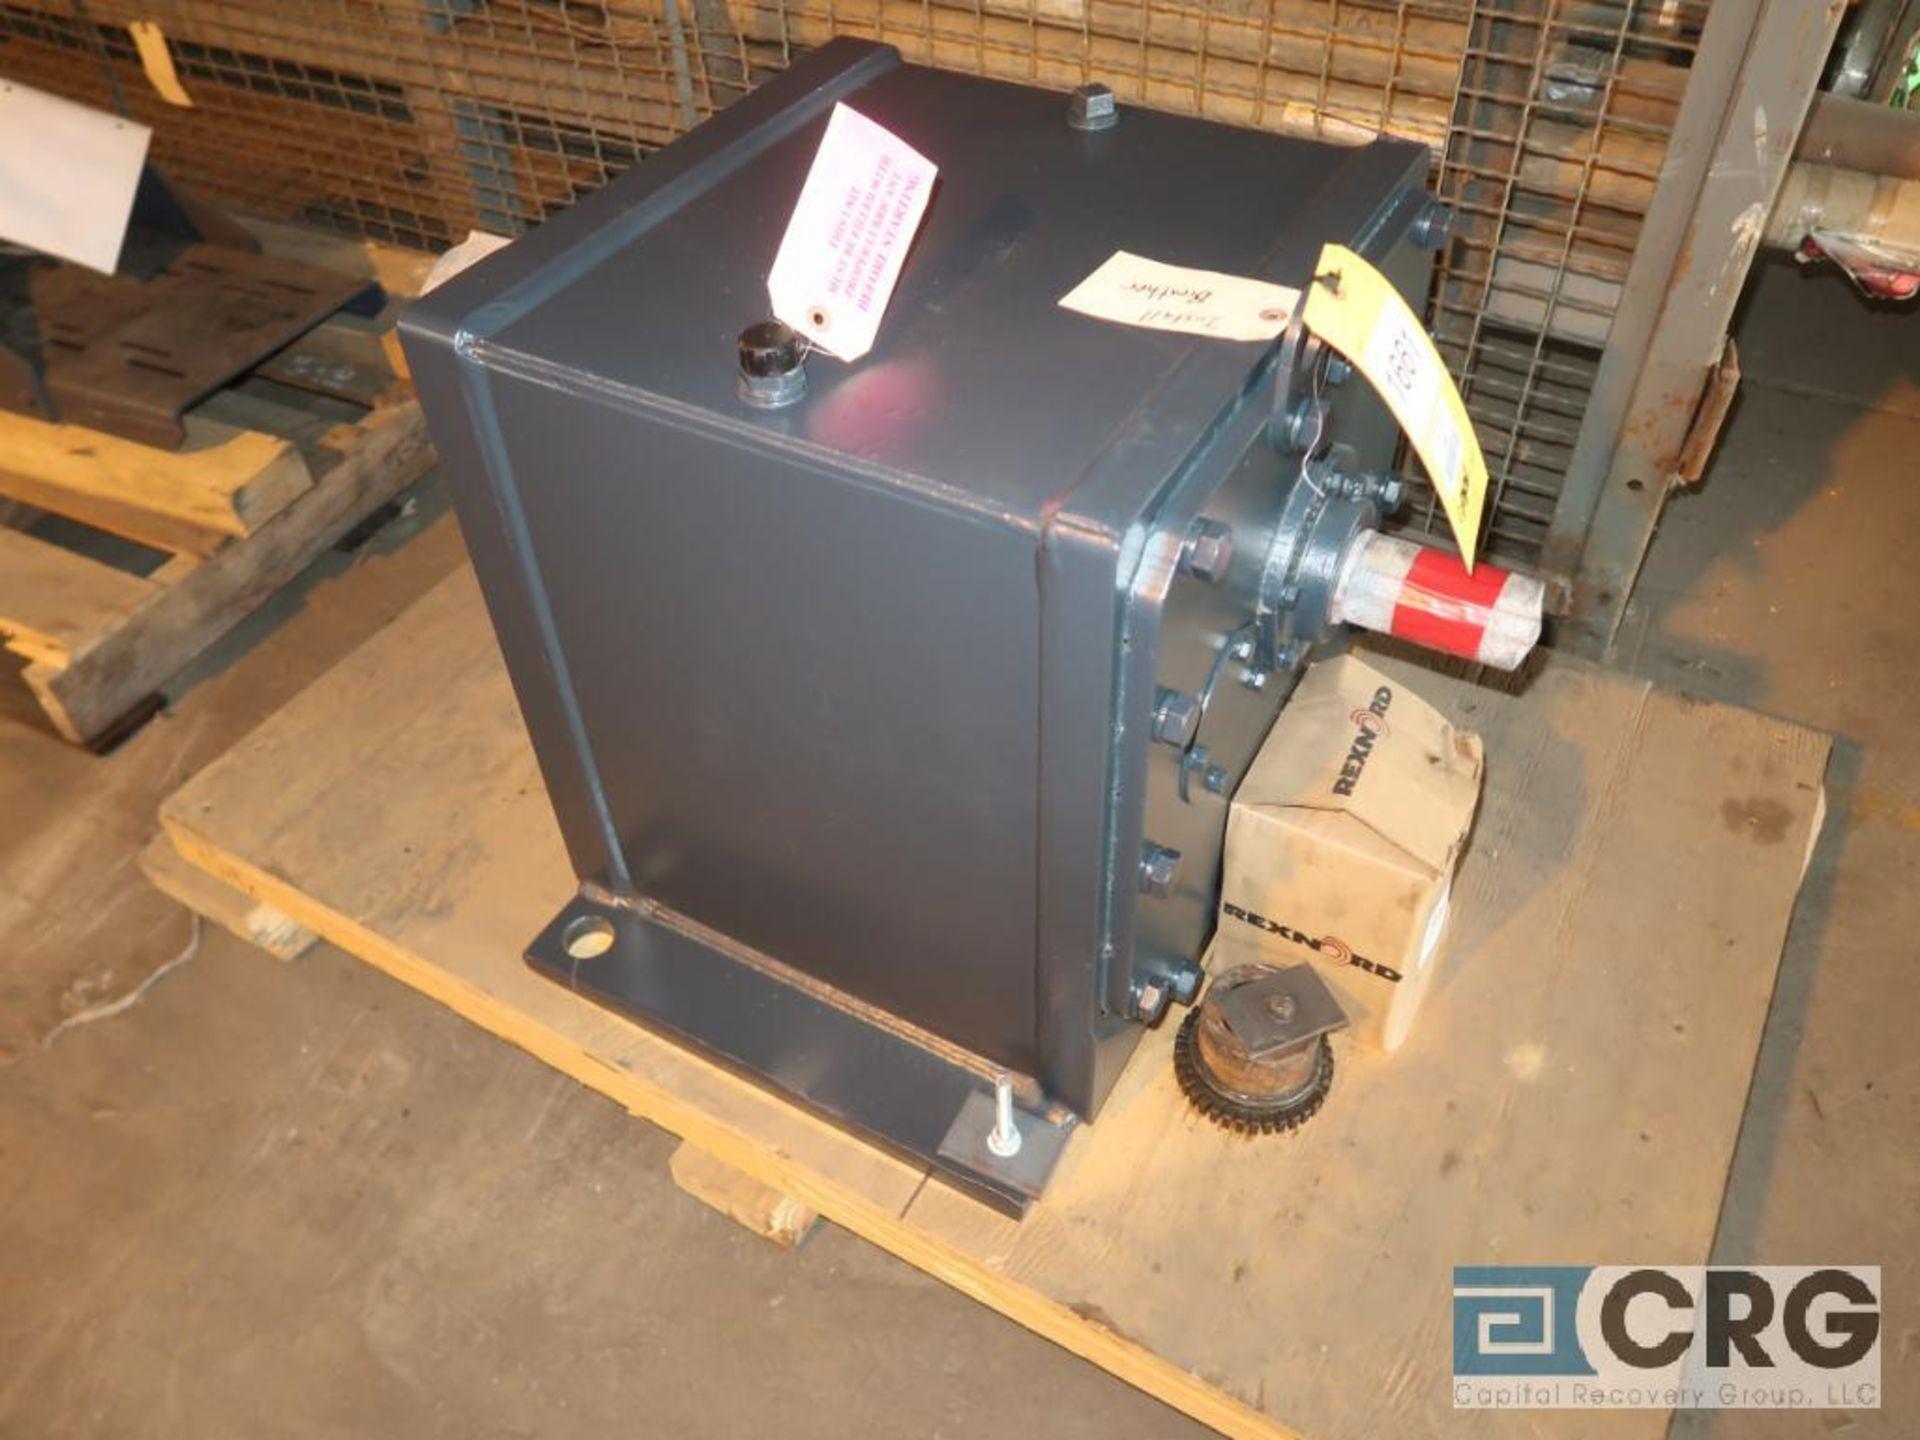 Falk 1080FZ34 gear drive, ratio-48.11, input RPM 1,750, output RPM 36, service rate HP. 25, s/n